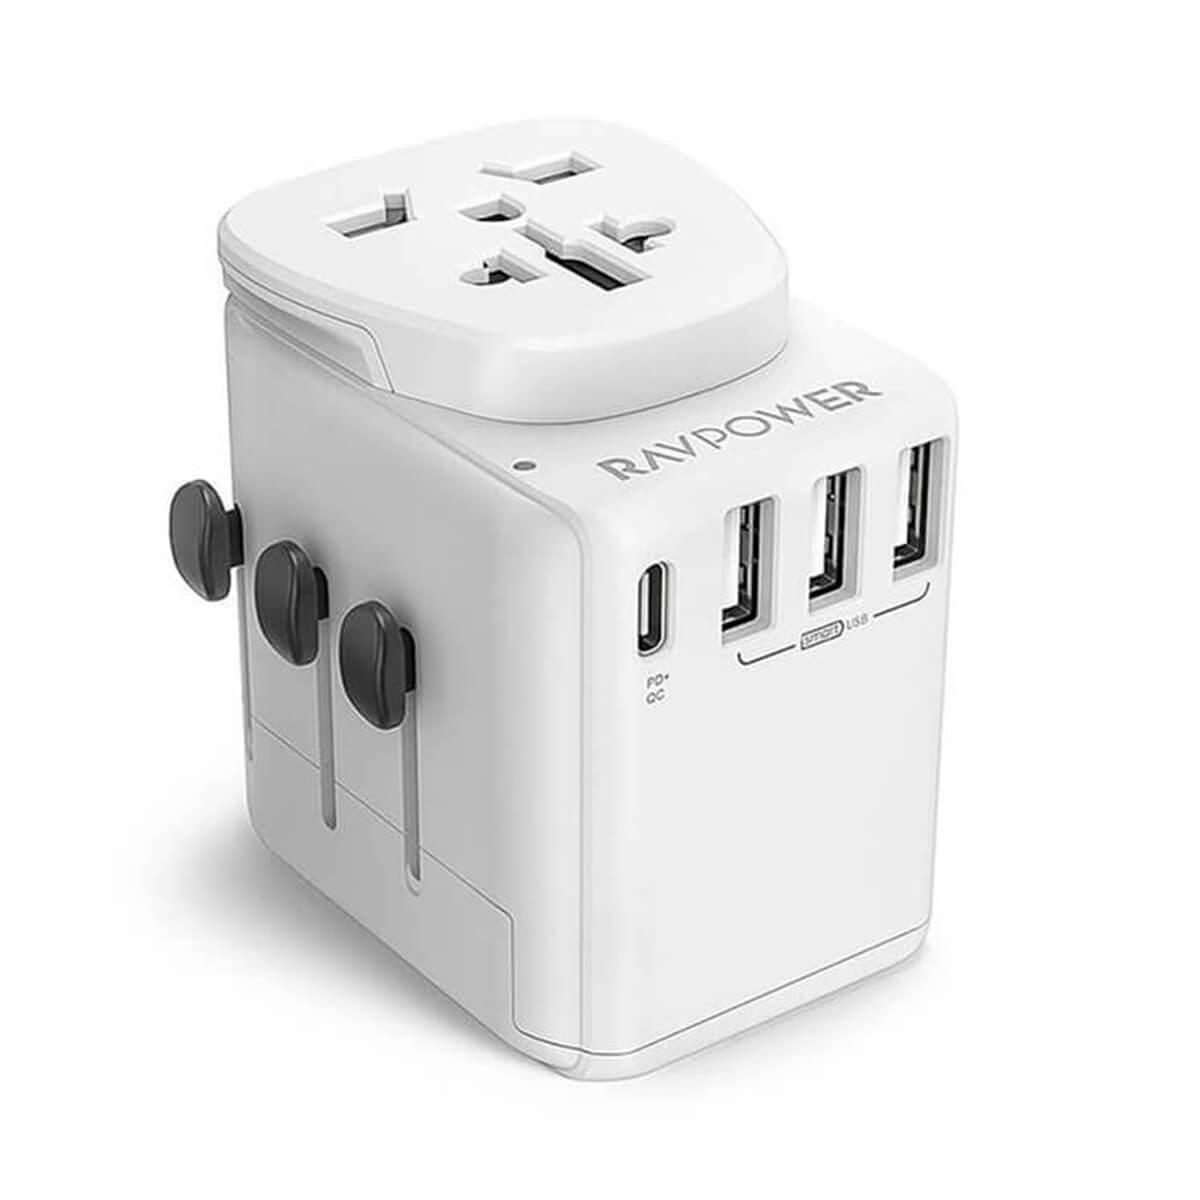 Сетевое зарядное устройство RAVPower Diplomat 30W 4-Port Travel Charger (RP-PC099)